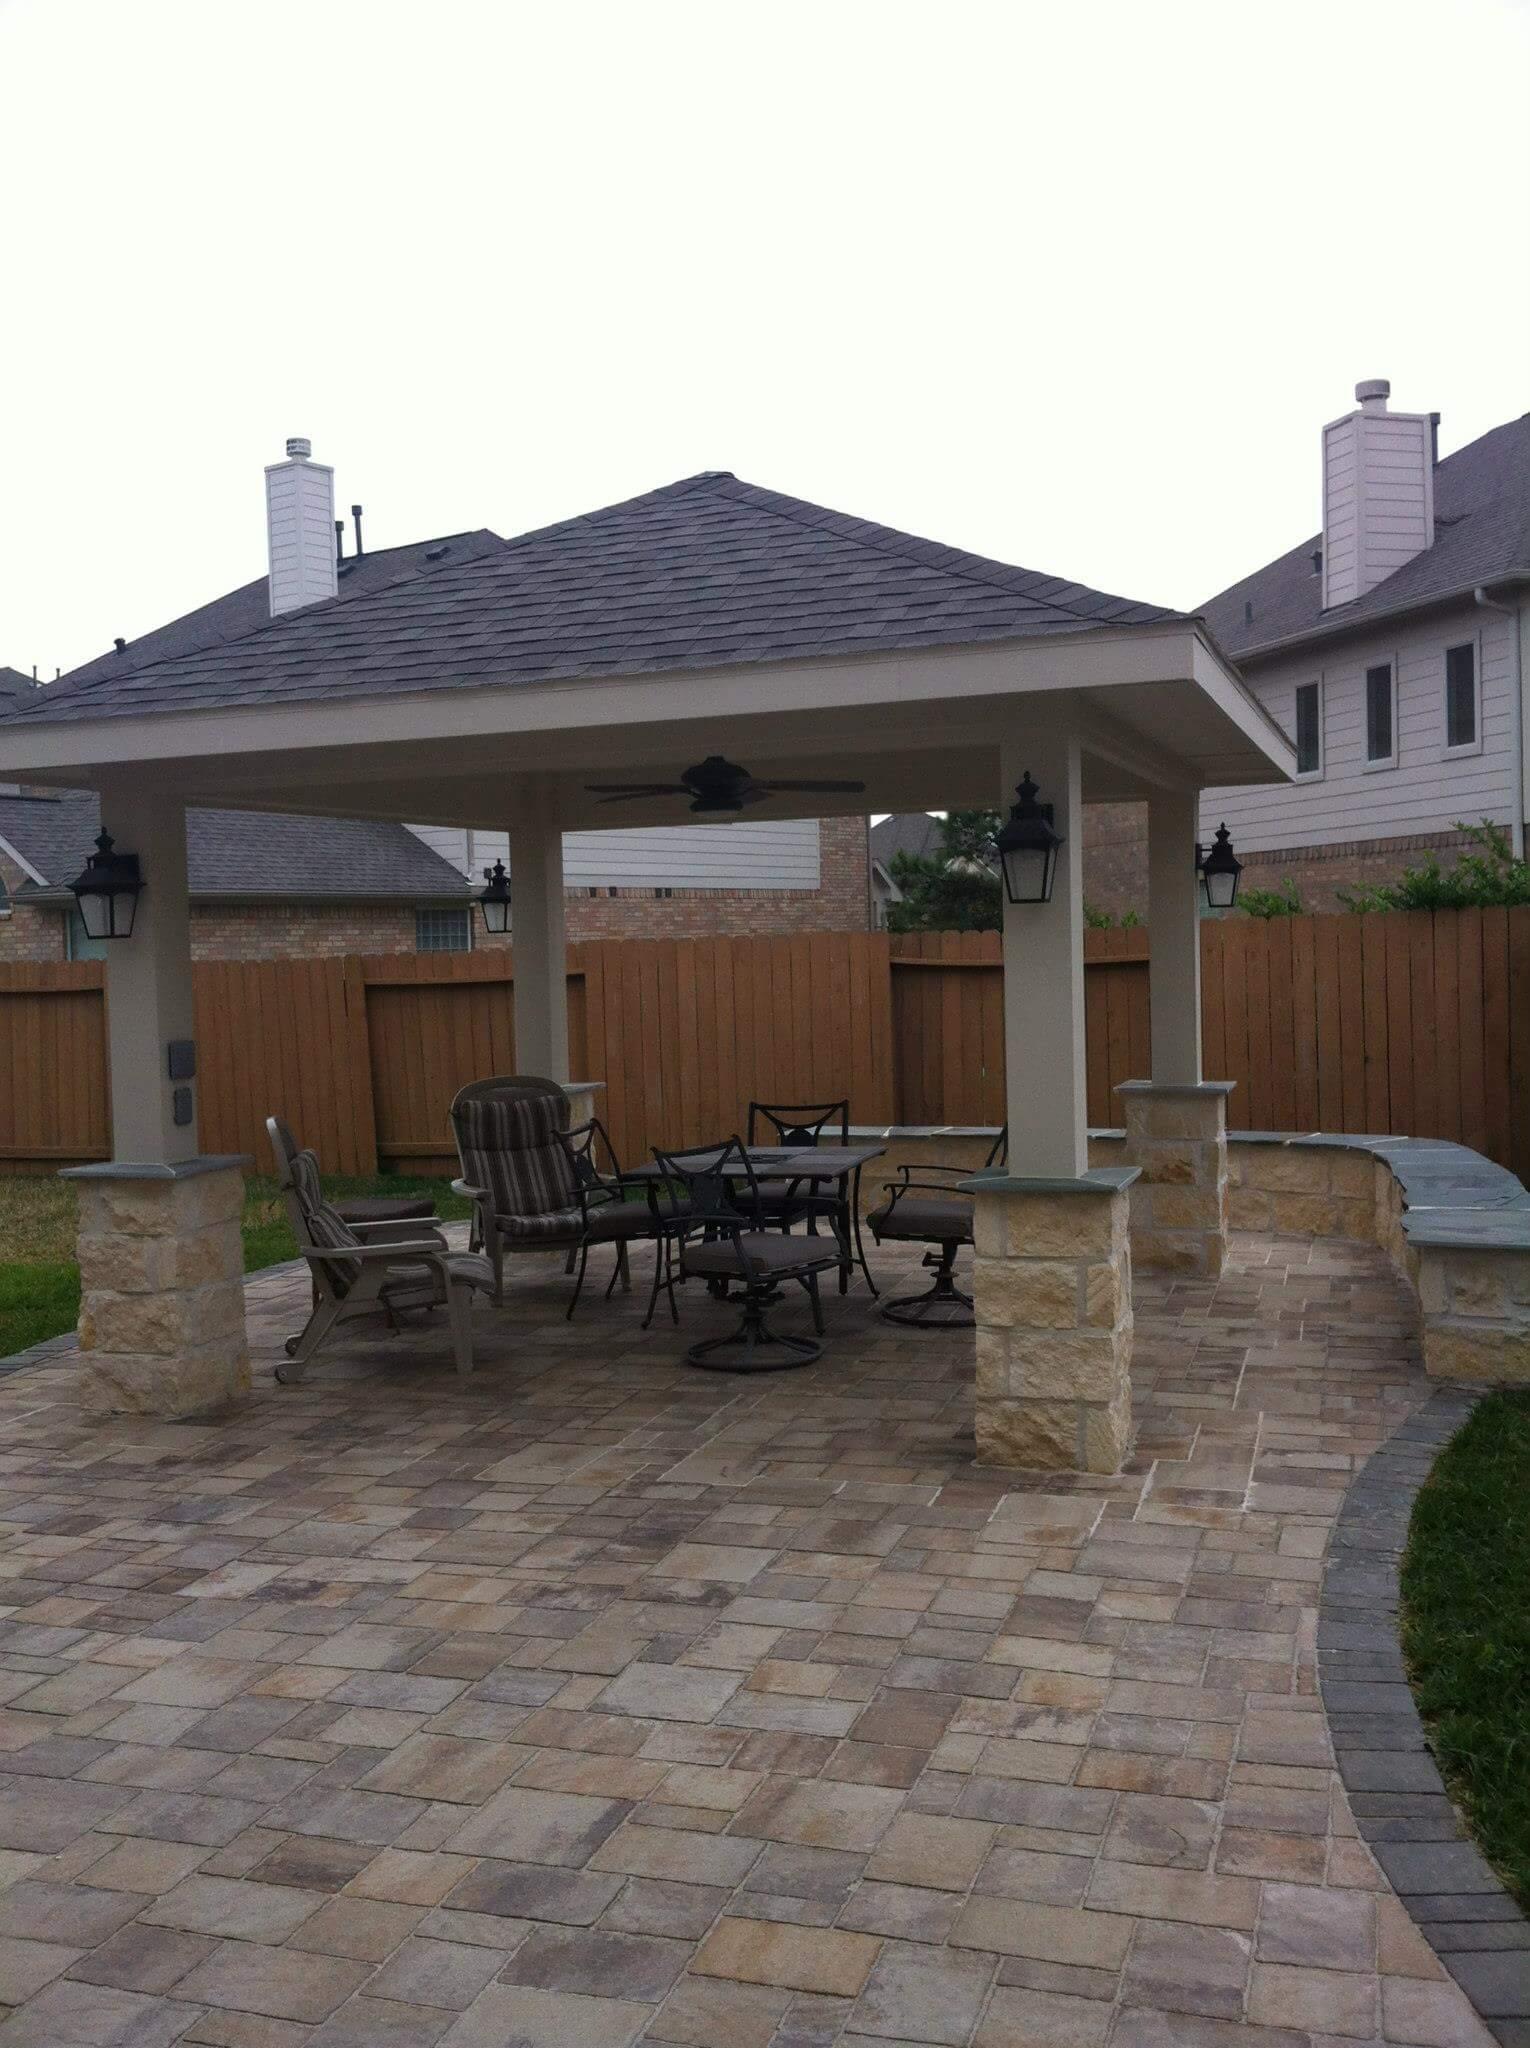 Top Backyard Pergola Ideas for Your Garden - KUKUN on Covered Pergola Ideas  id=87587